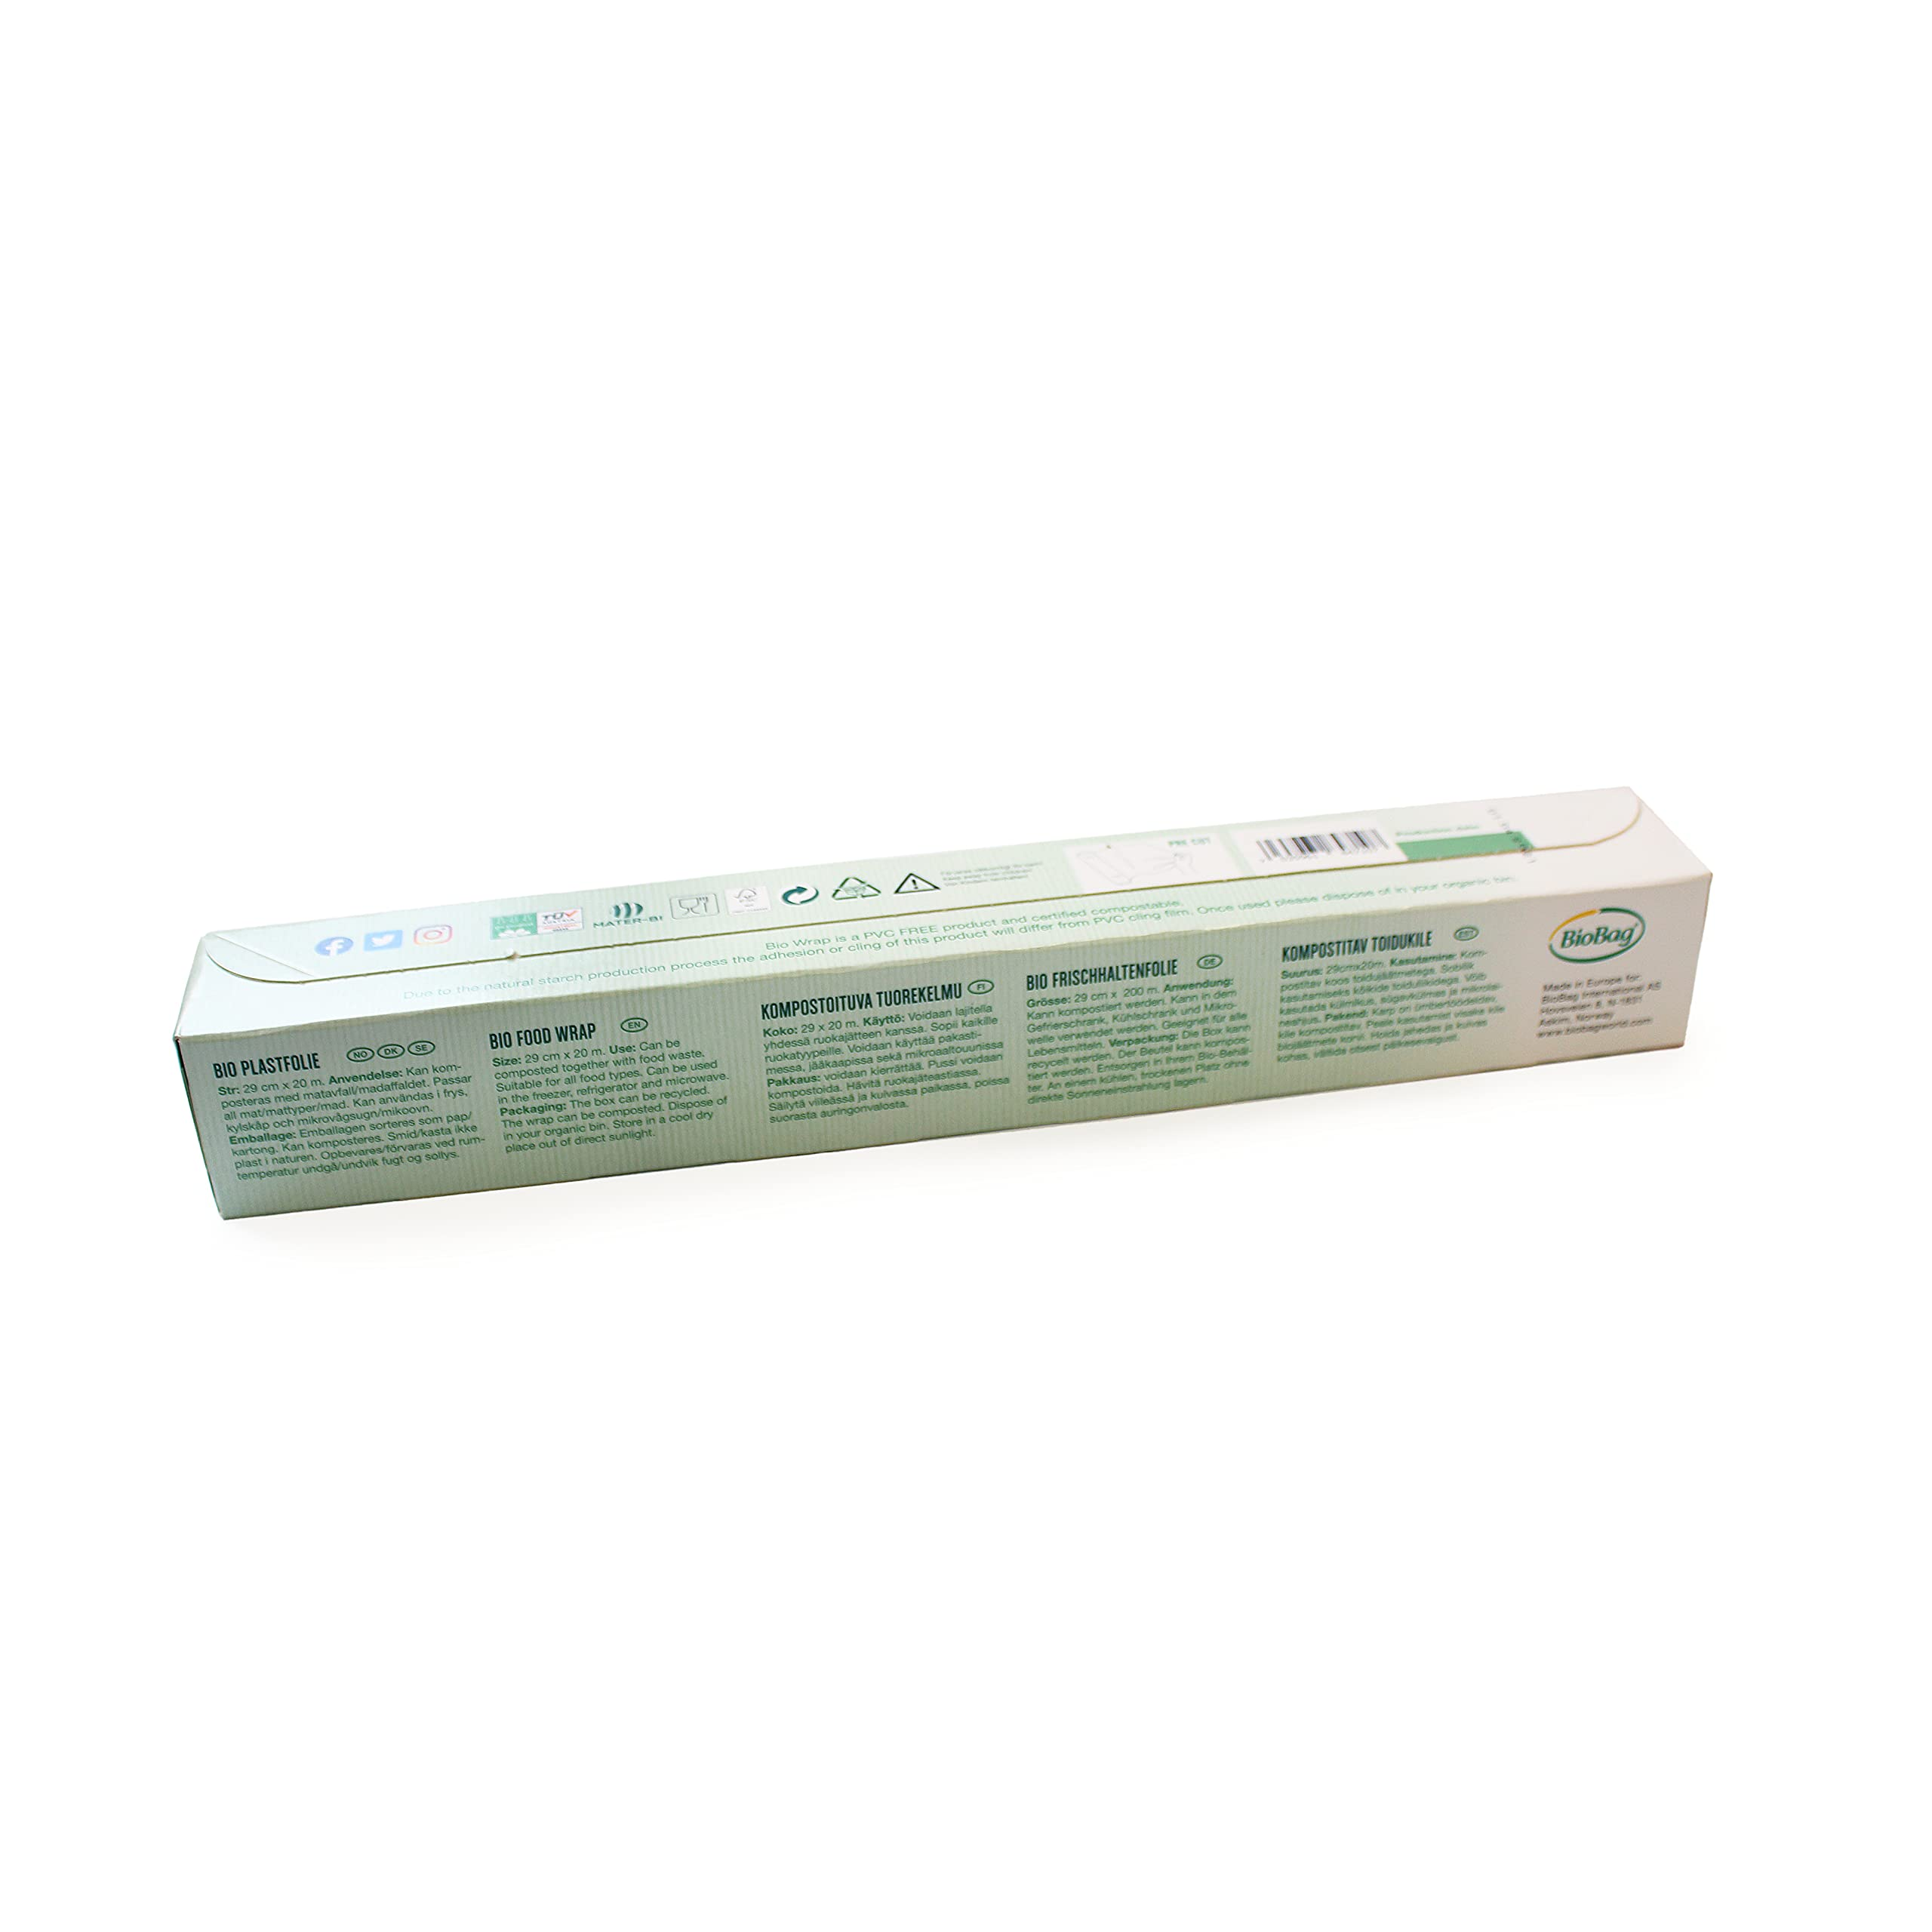 100/% Degradable Non-PVC All Purpose Cling Film 4 x 20M Rolls Biodegradable